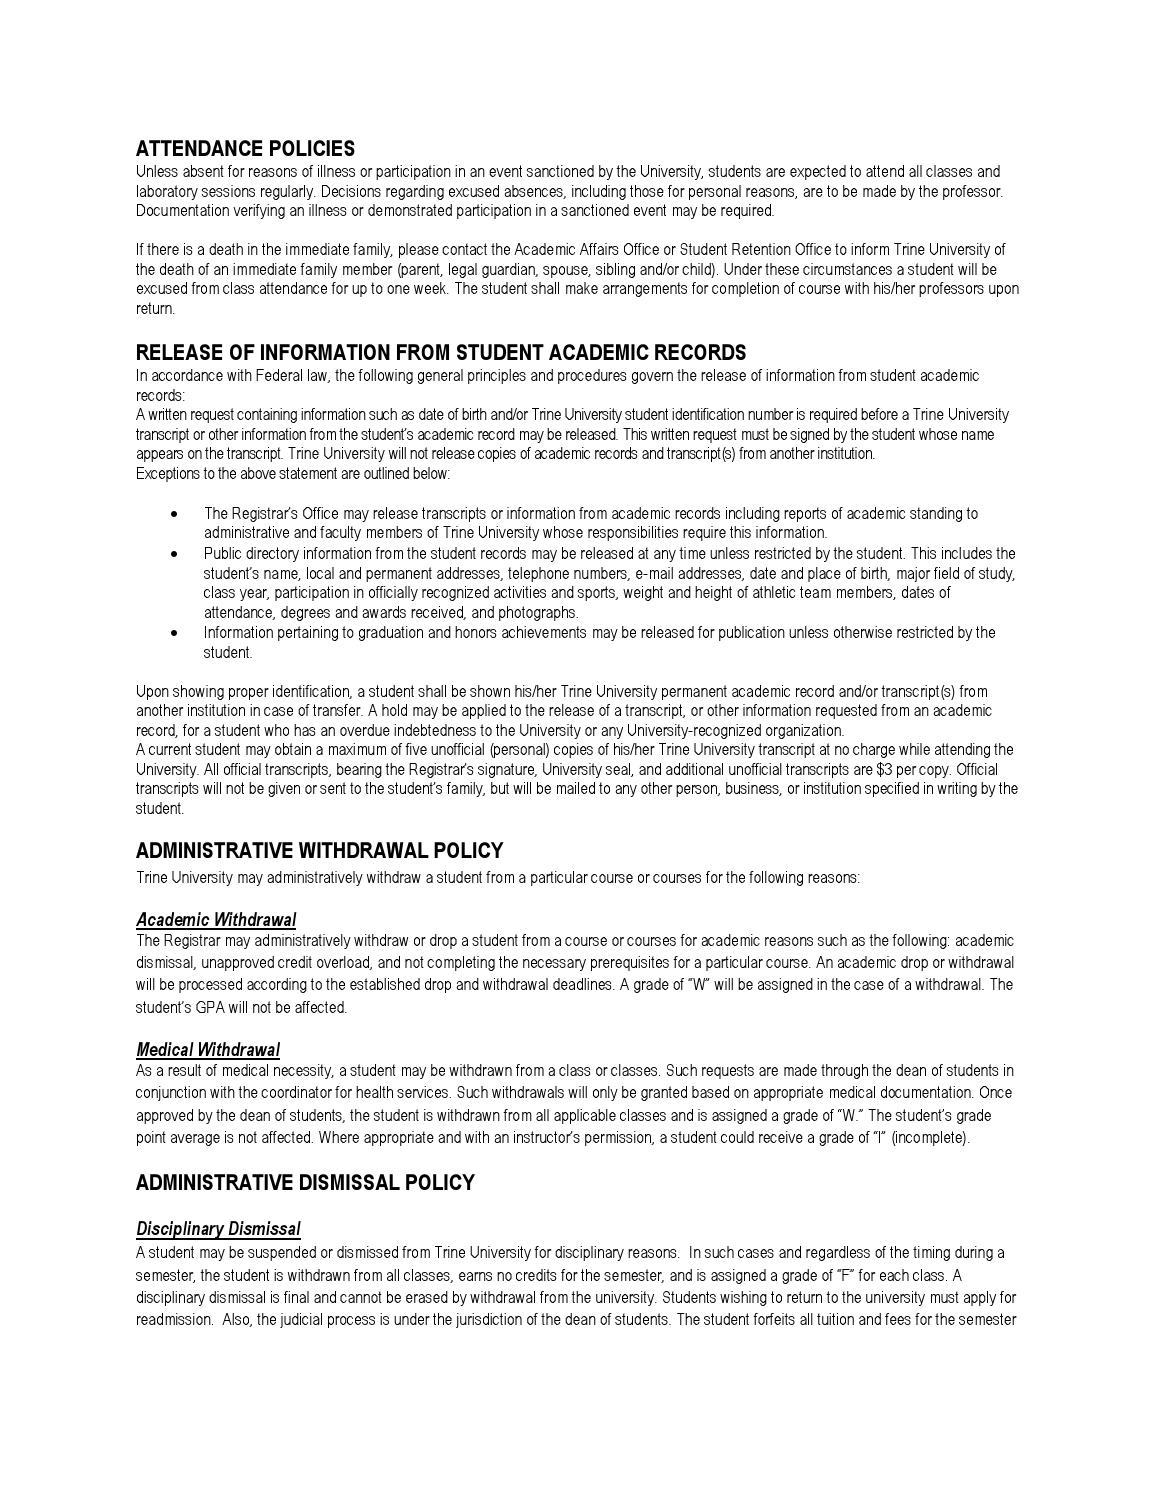 benefits of globalization essay environmental